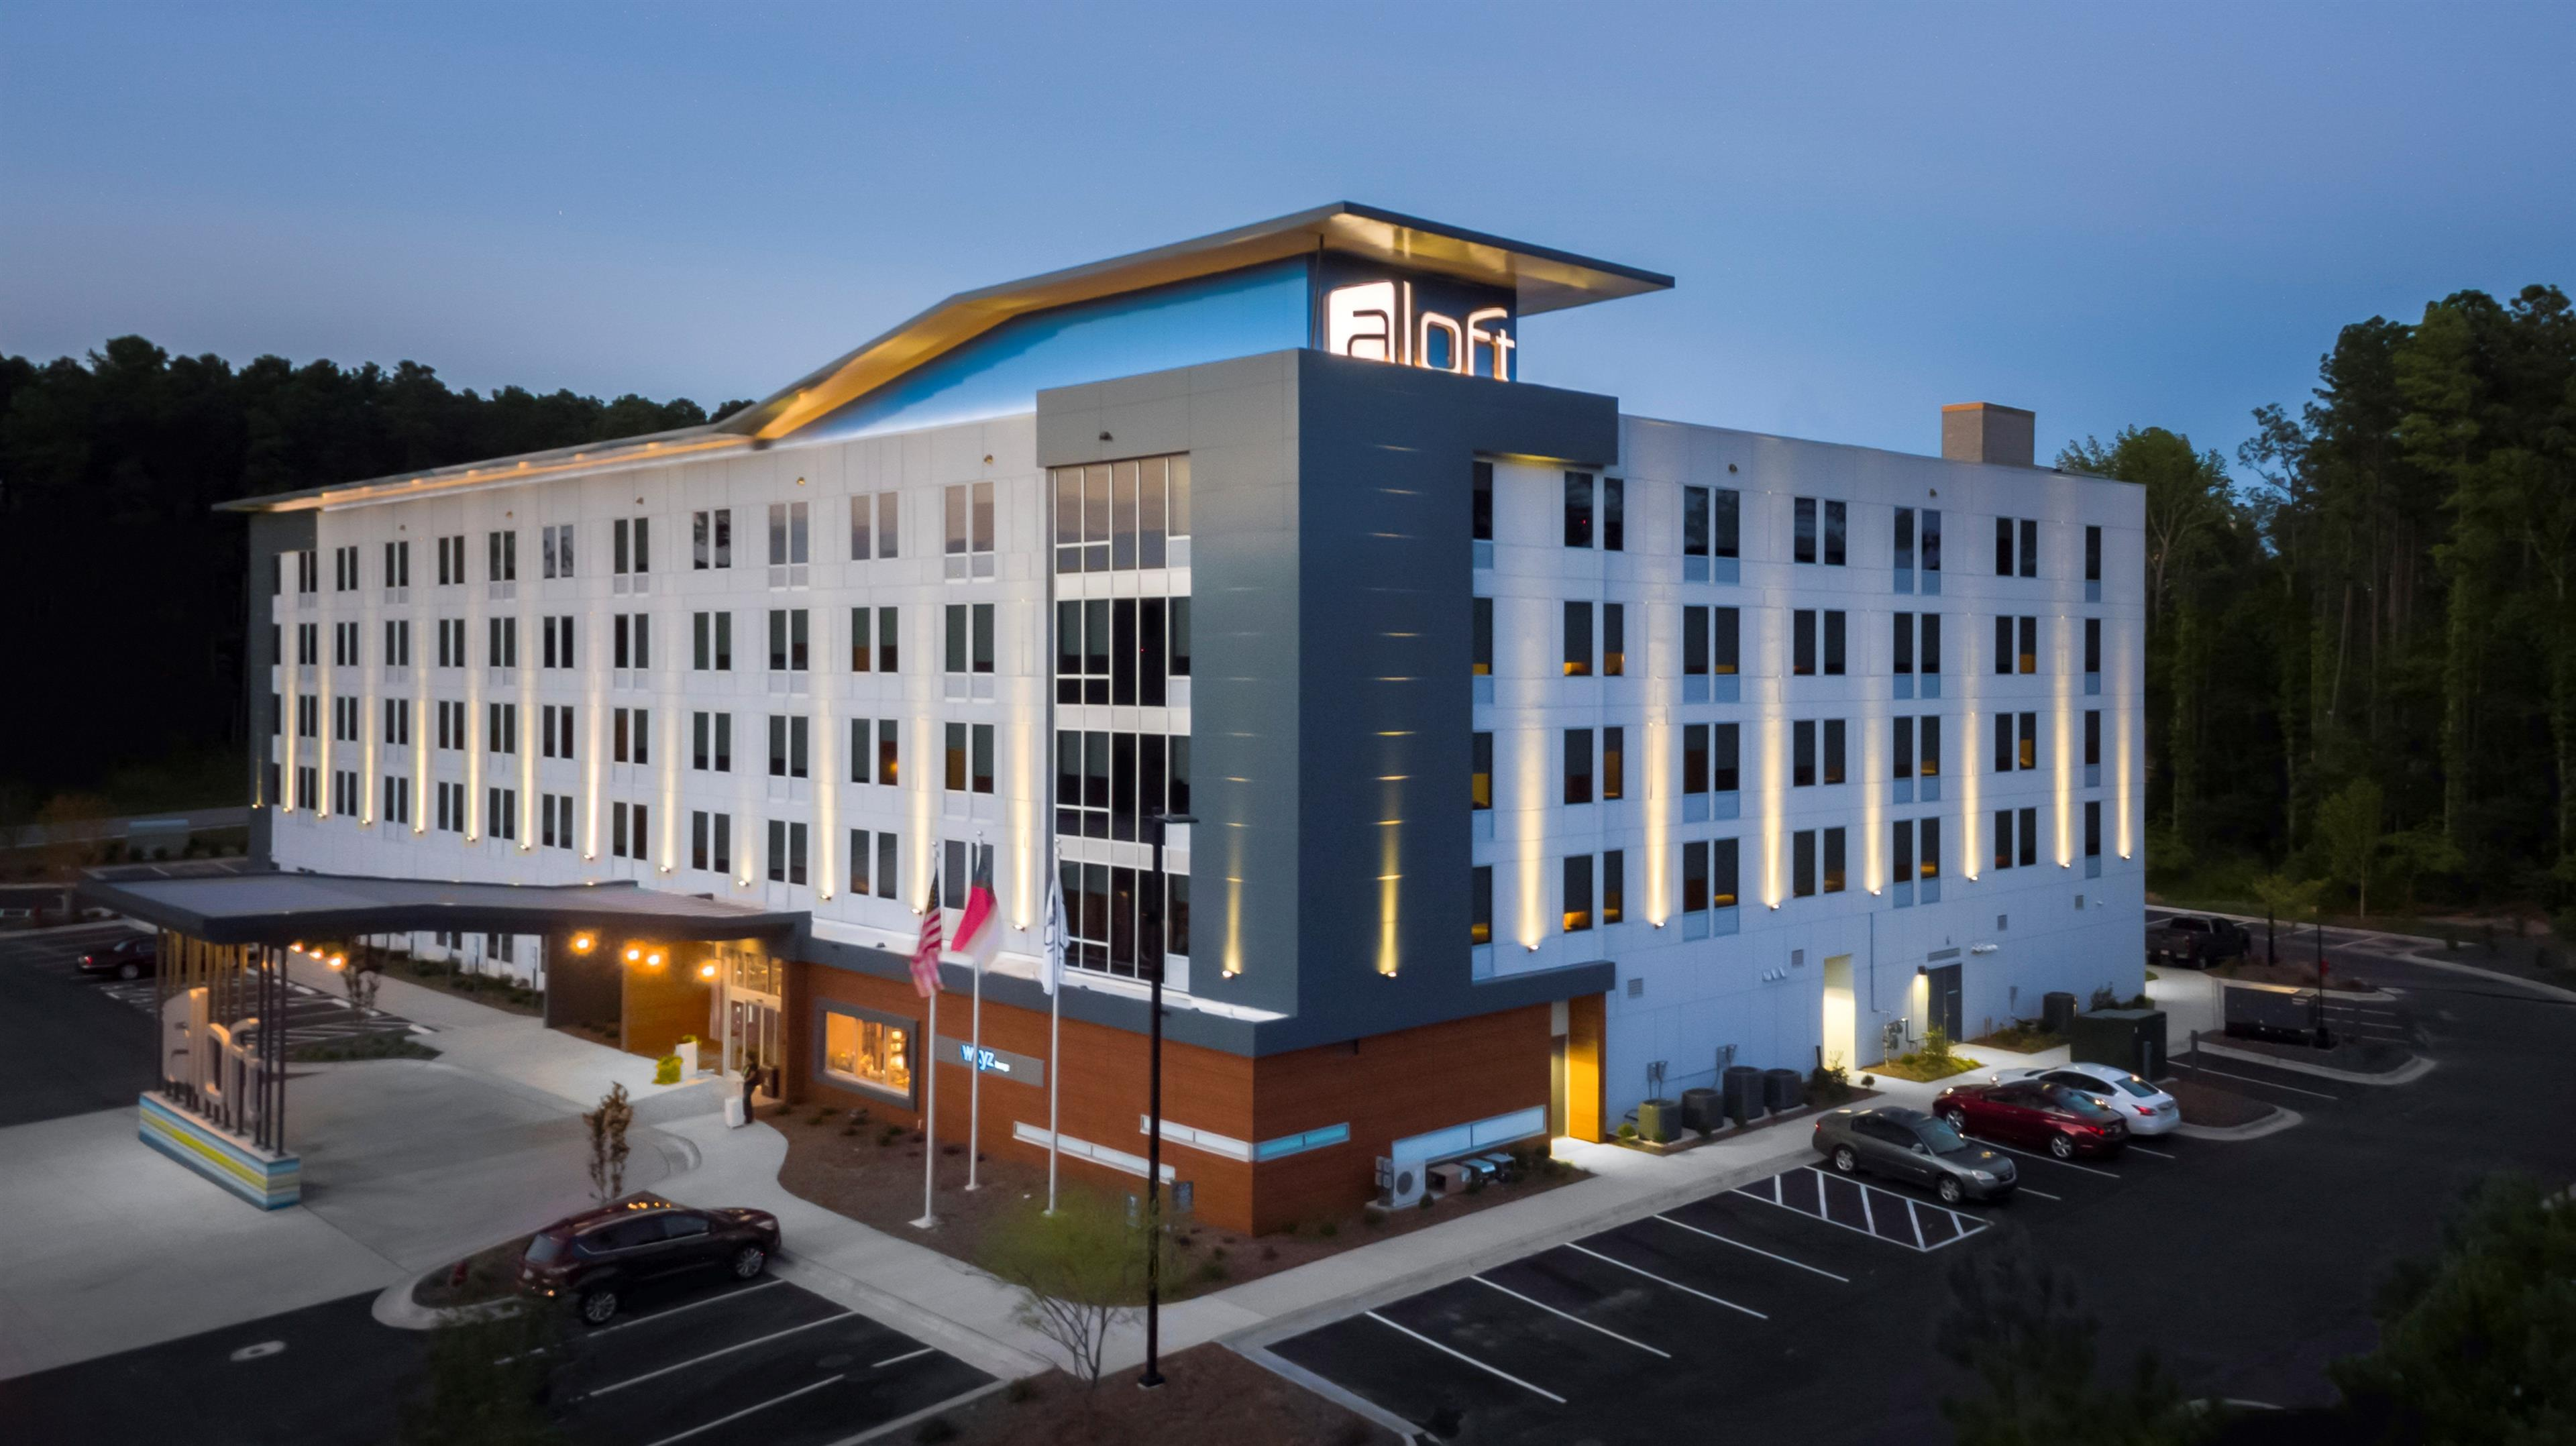 Hotel in NC Raleigh 27617 Aloft Raleigh-Durham Airport Brier Creek 10020 Sellona Street  (919)957-8523